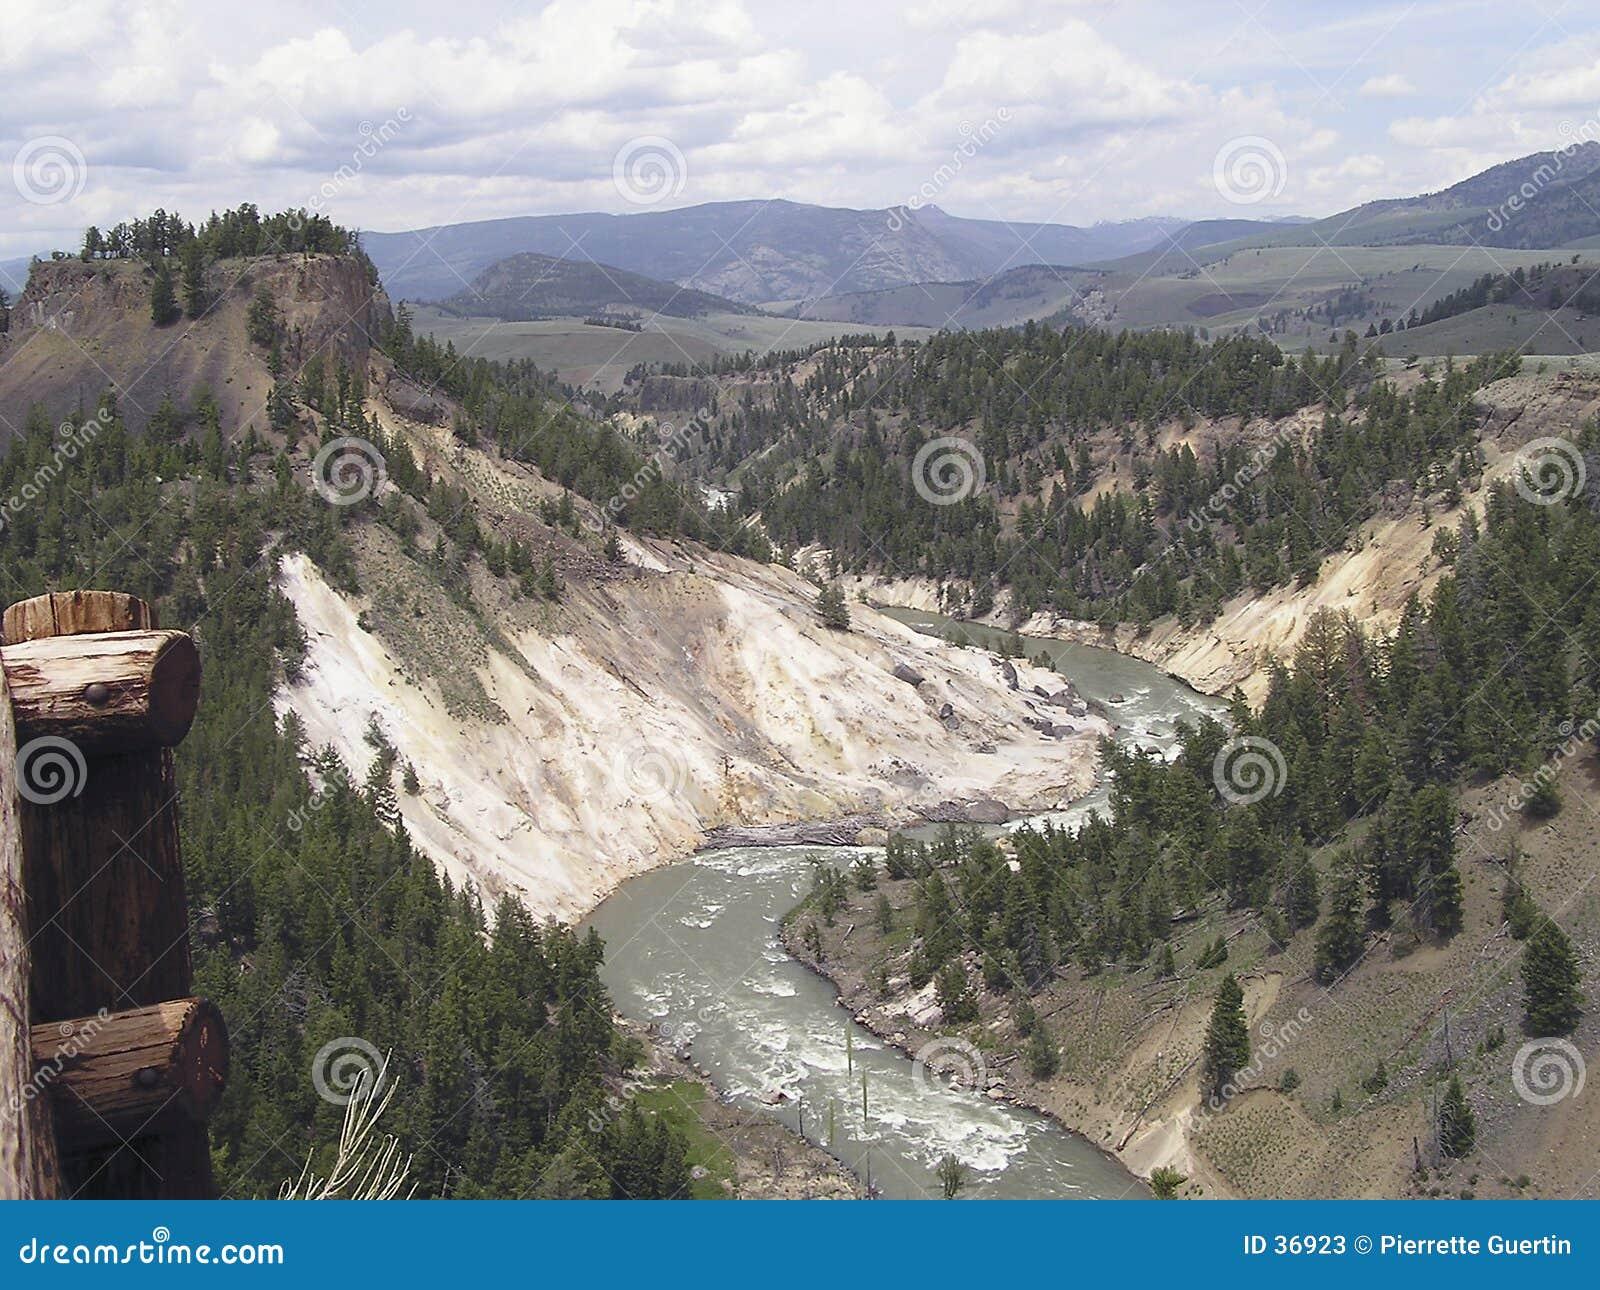 Canion - Yellowstone